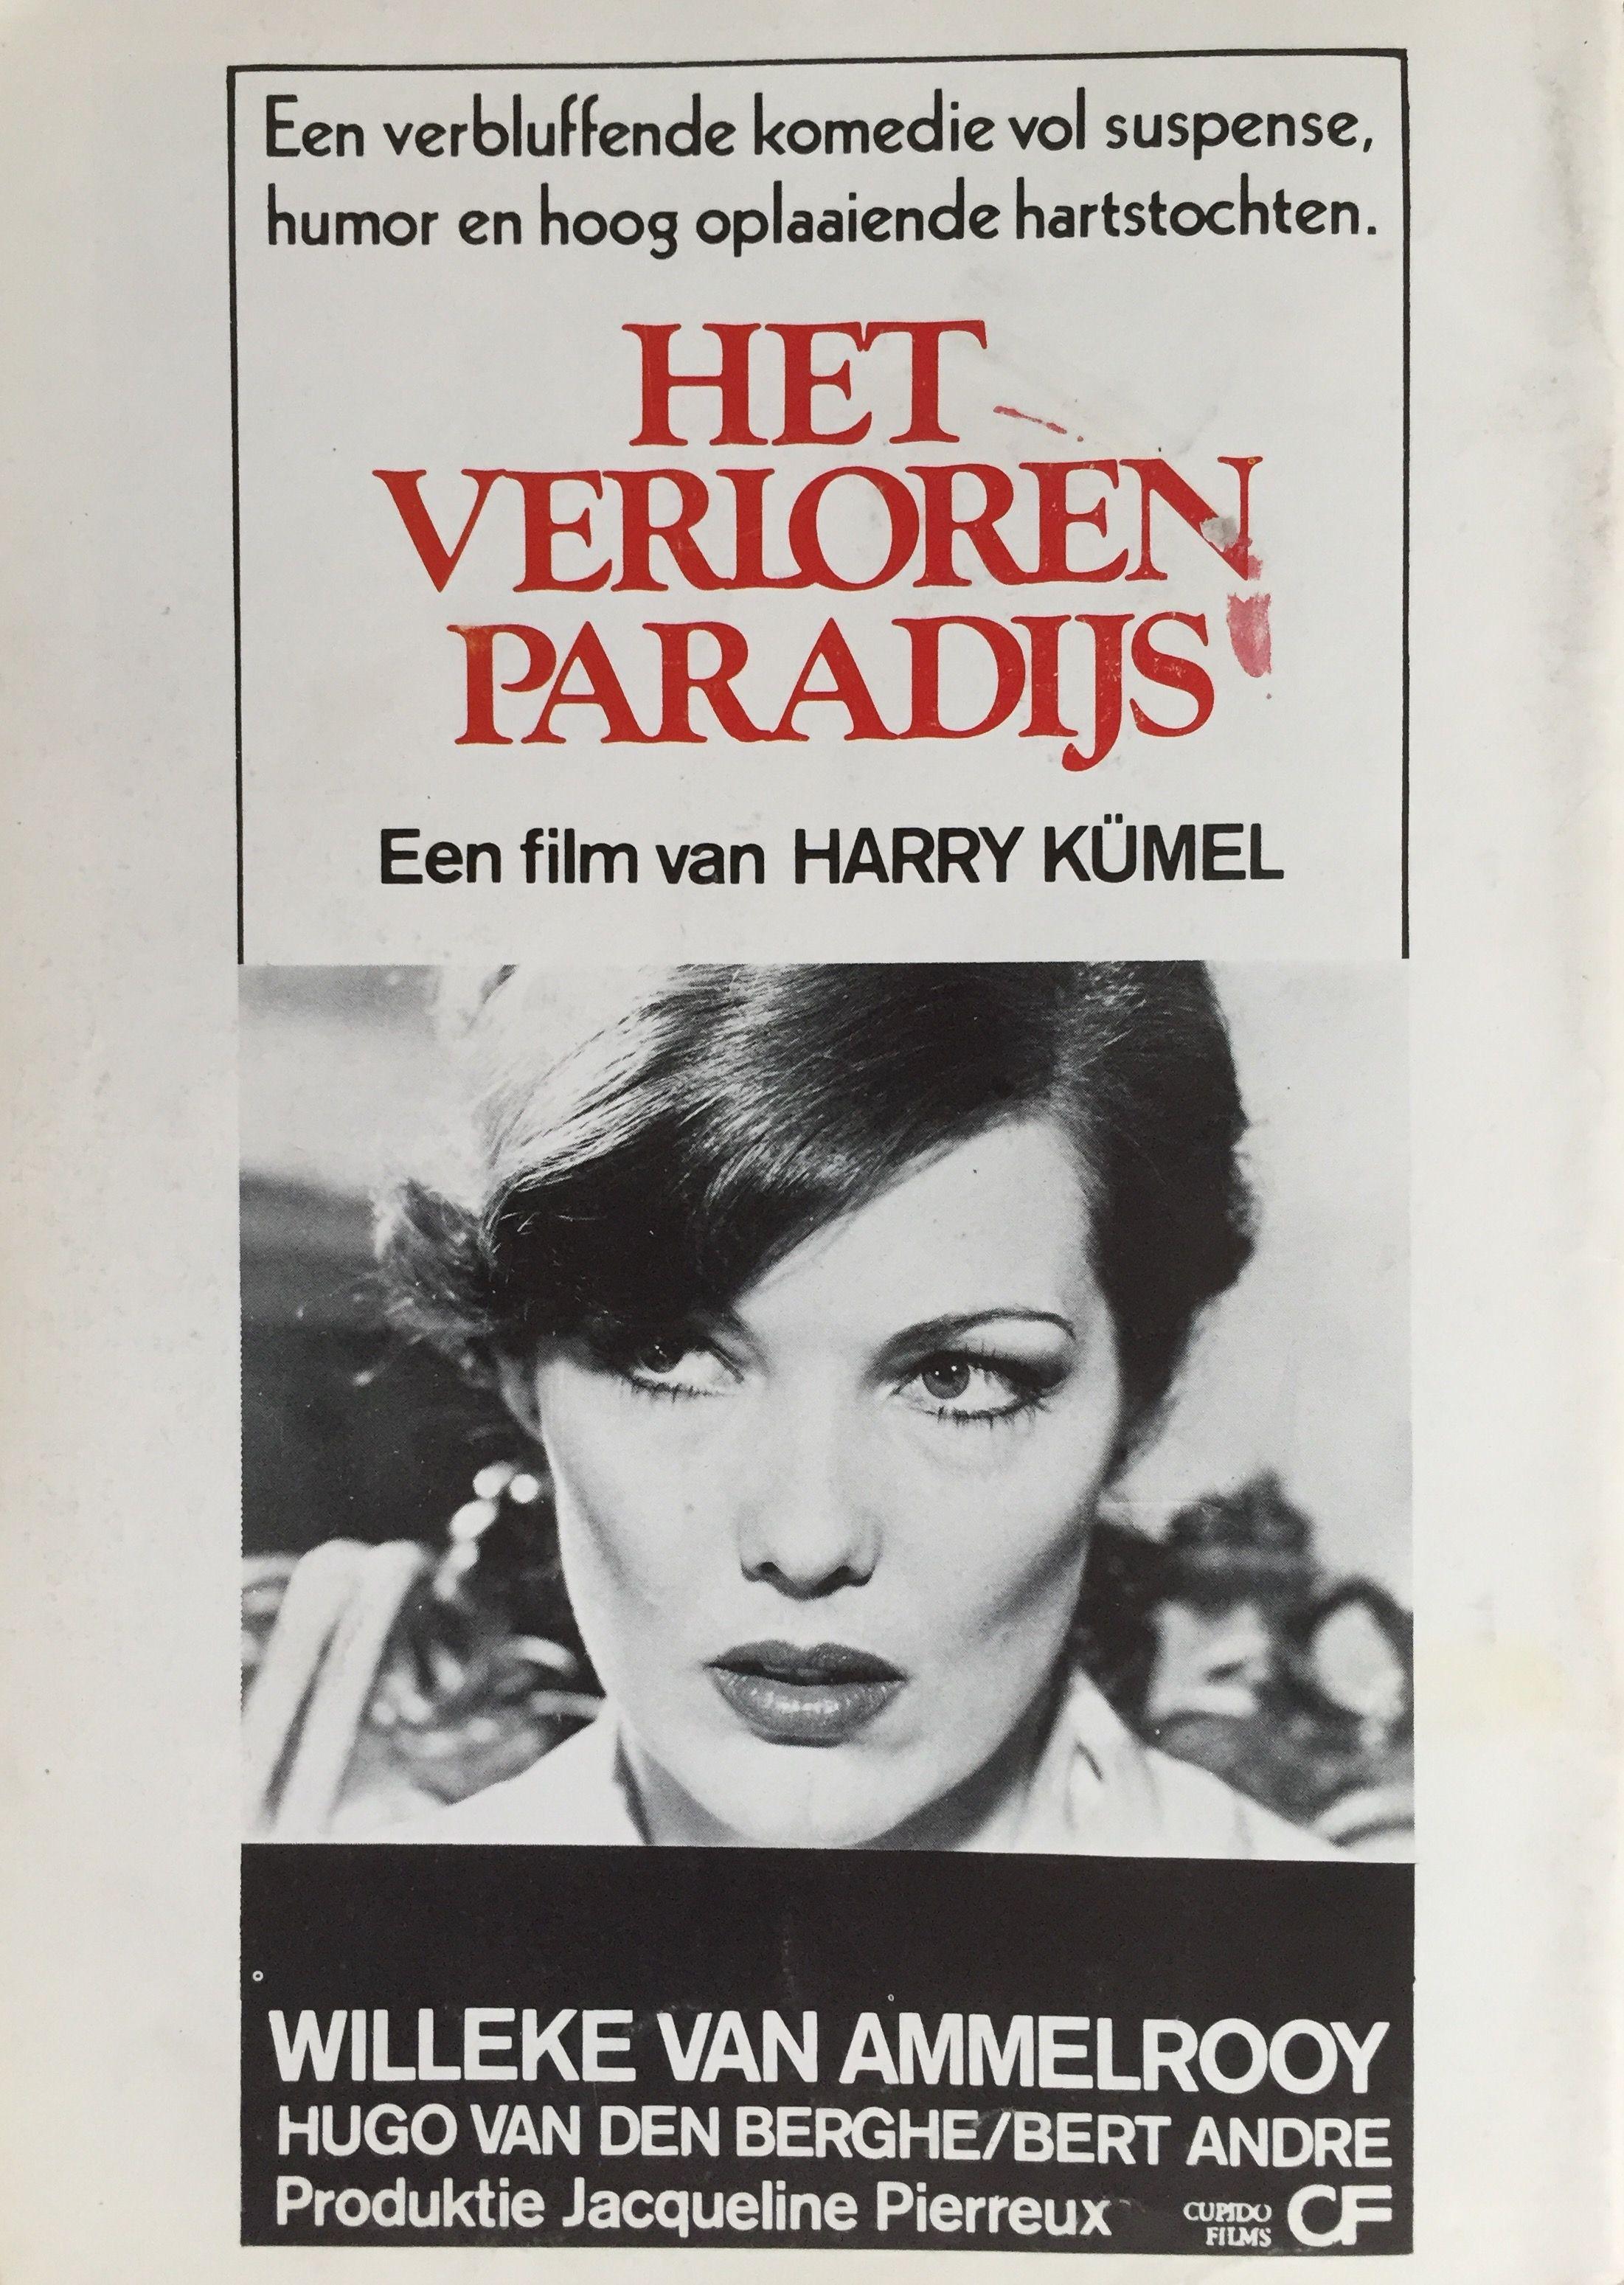 Pin on fantastic films